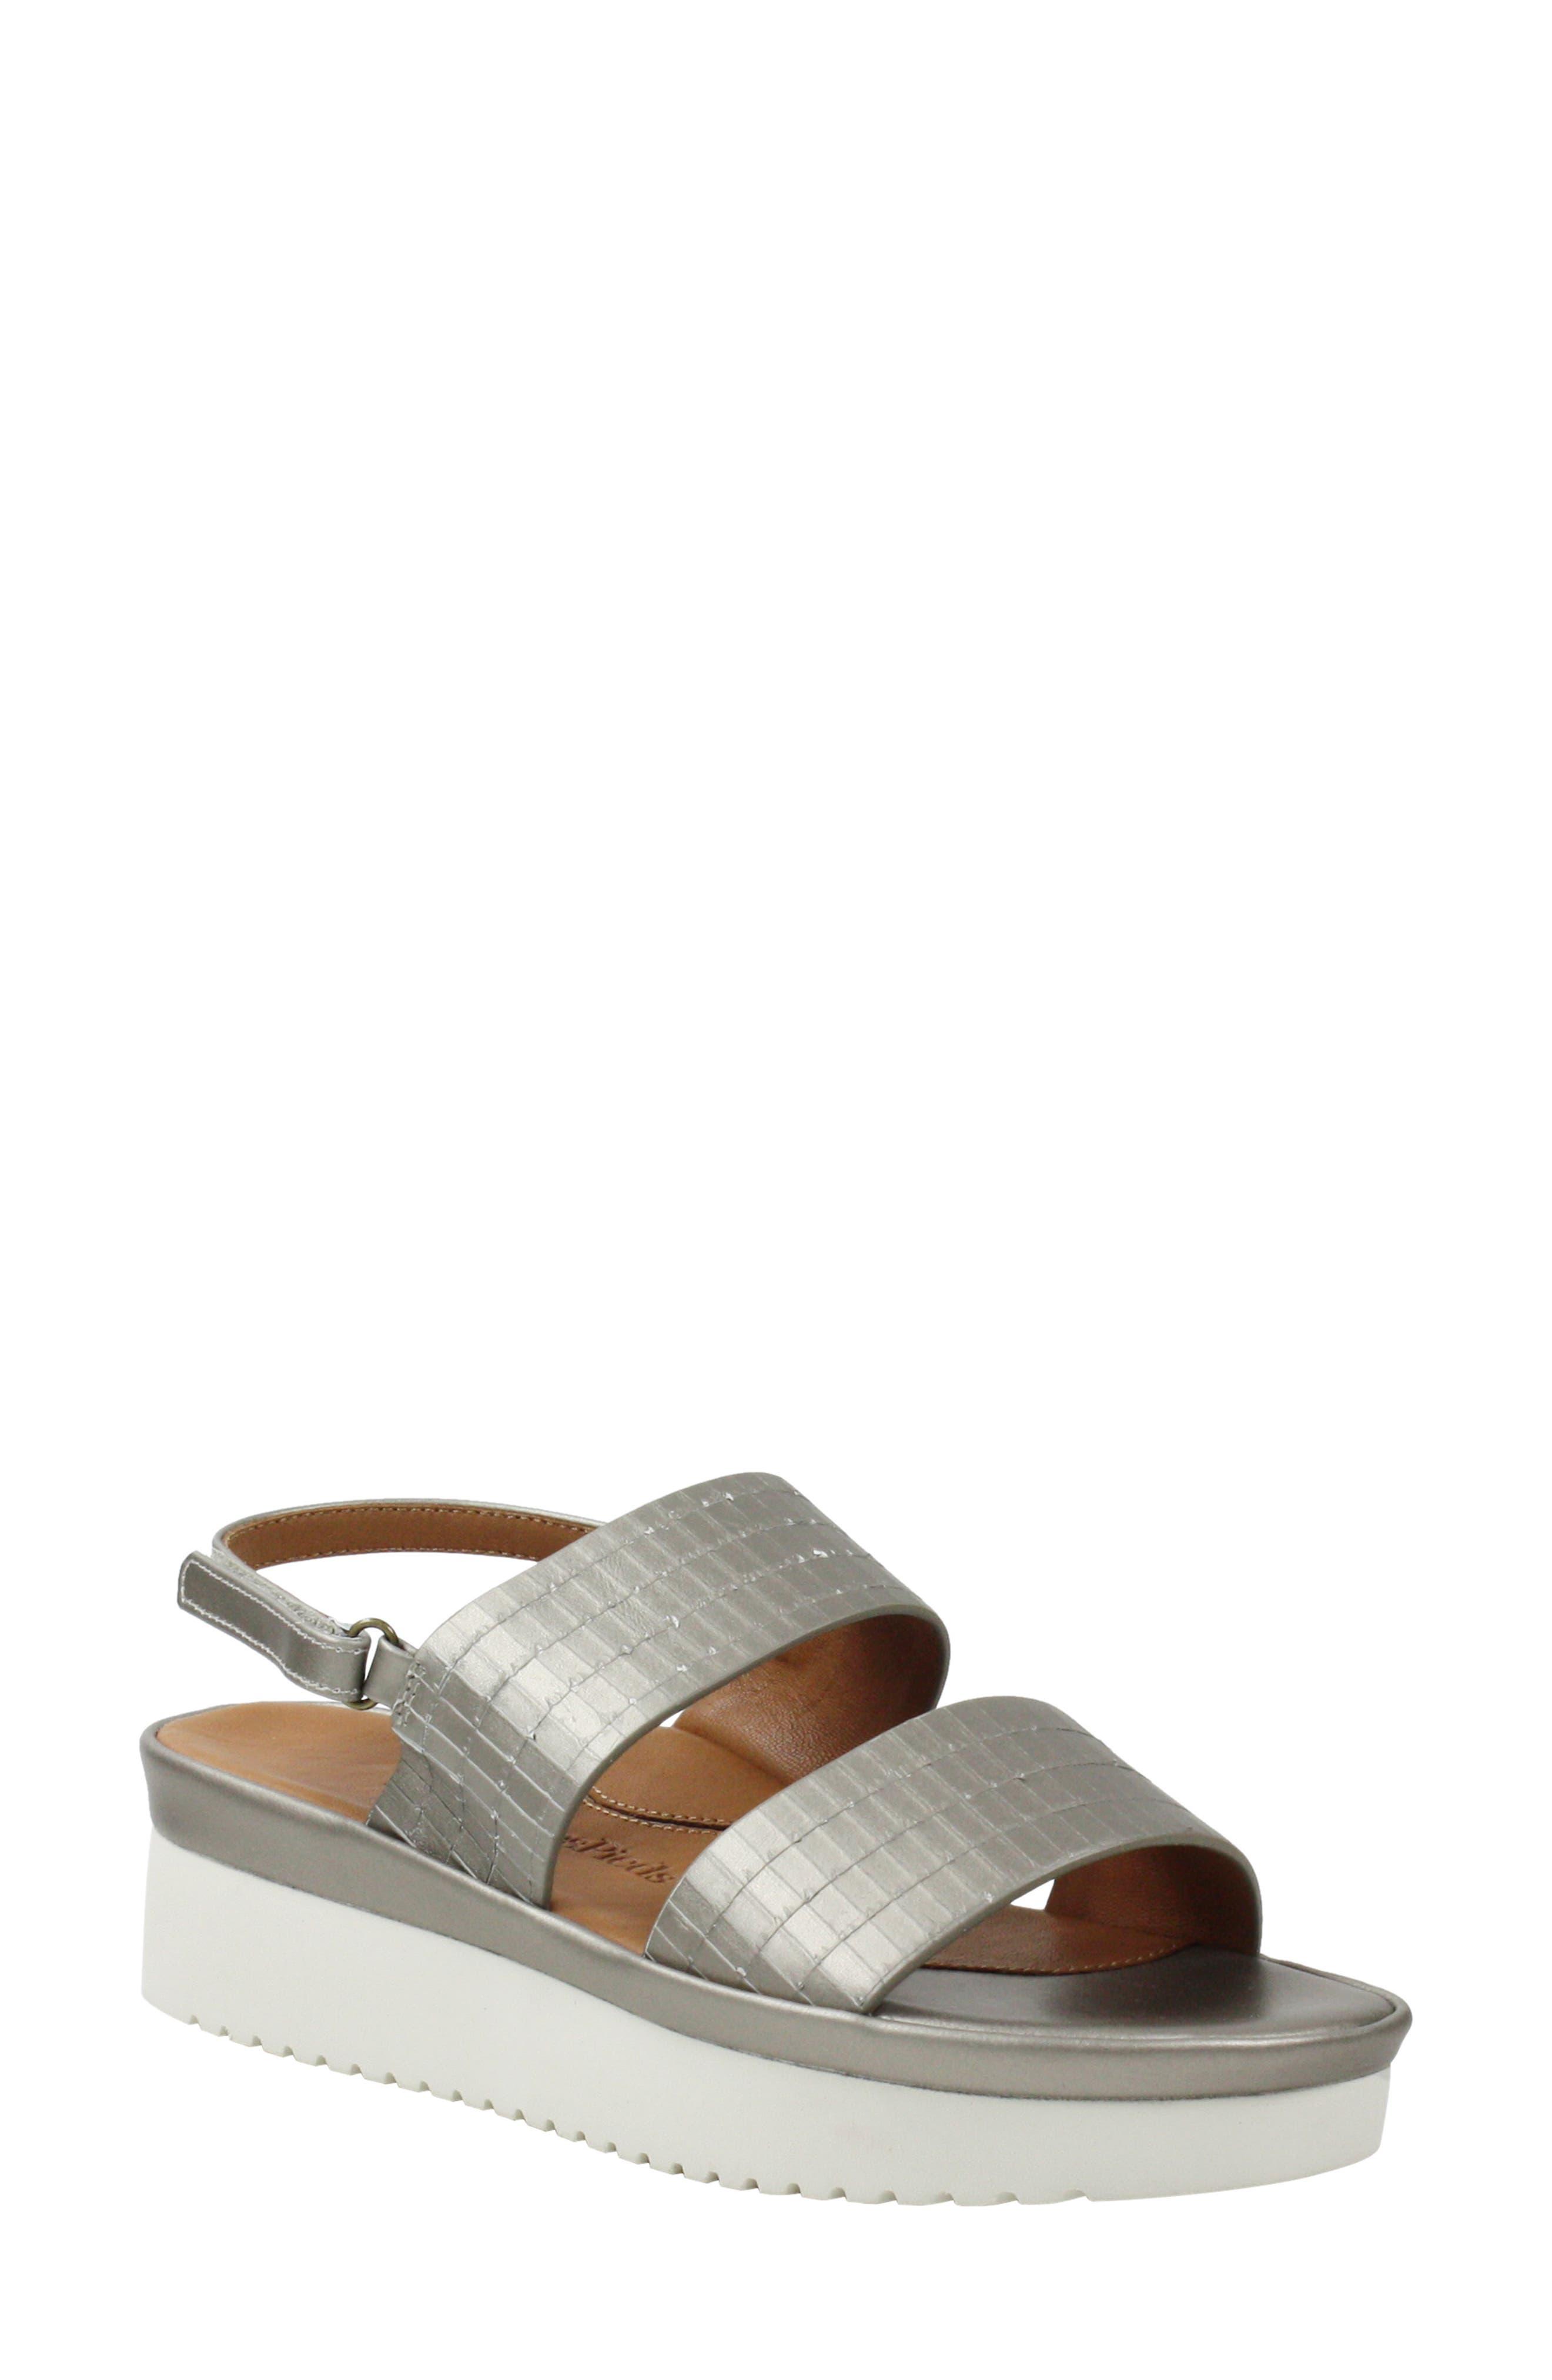 Abruzzo Slingback Platform Wedge Sandal